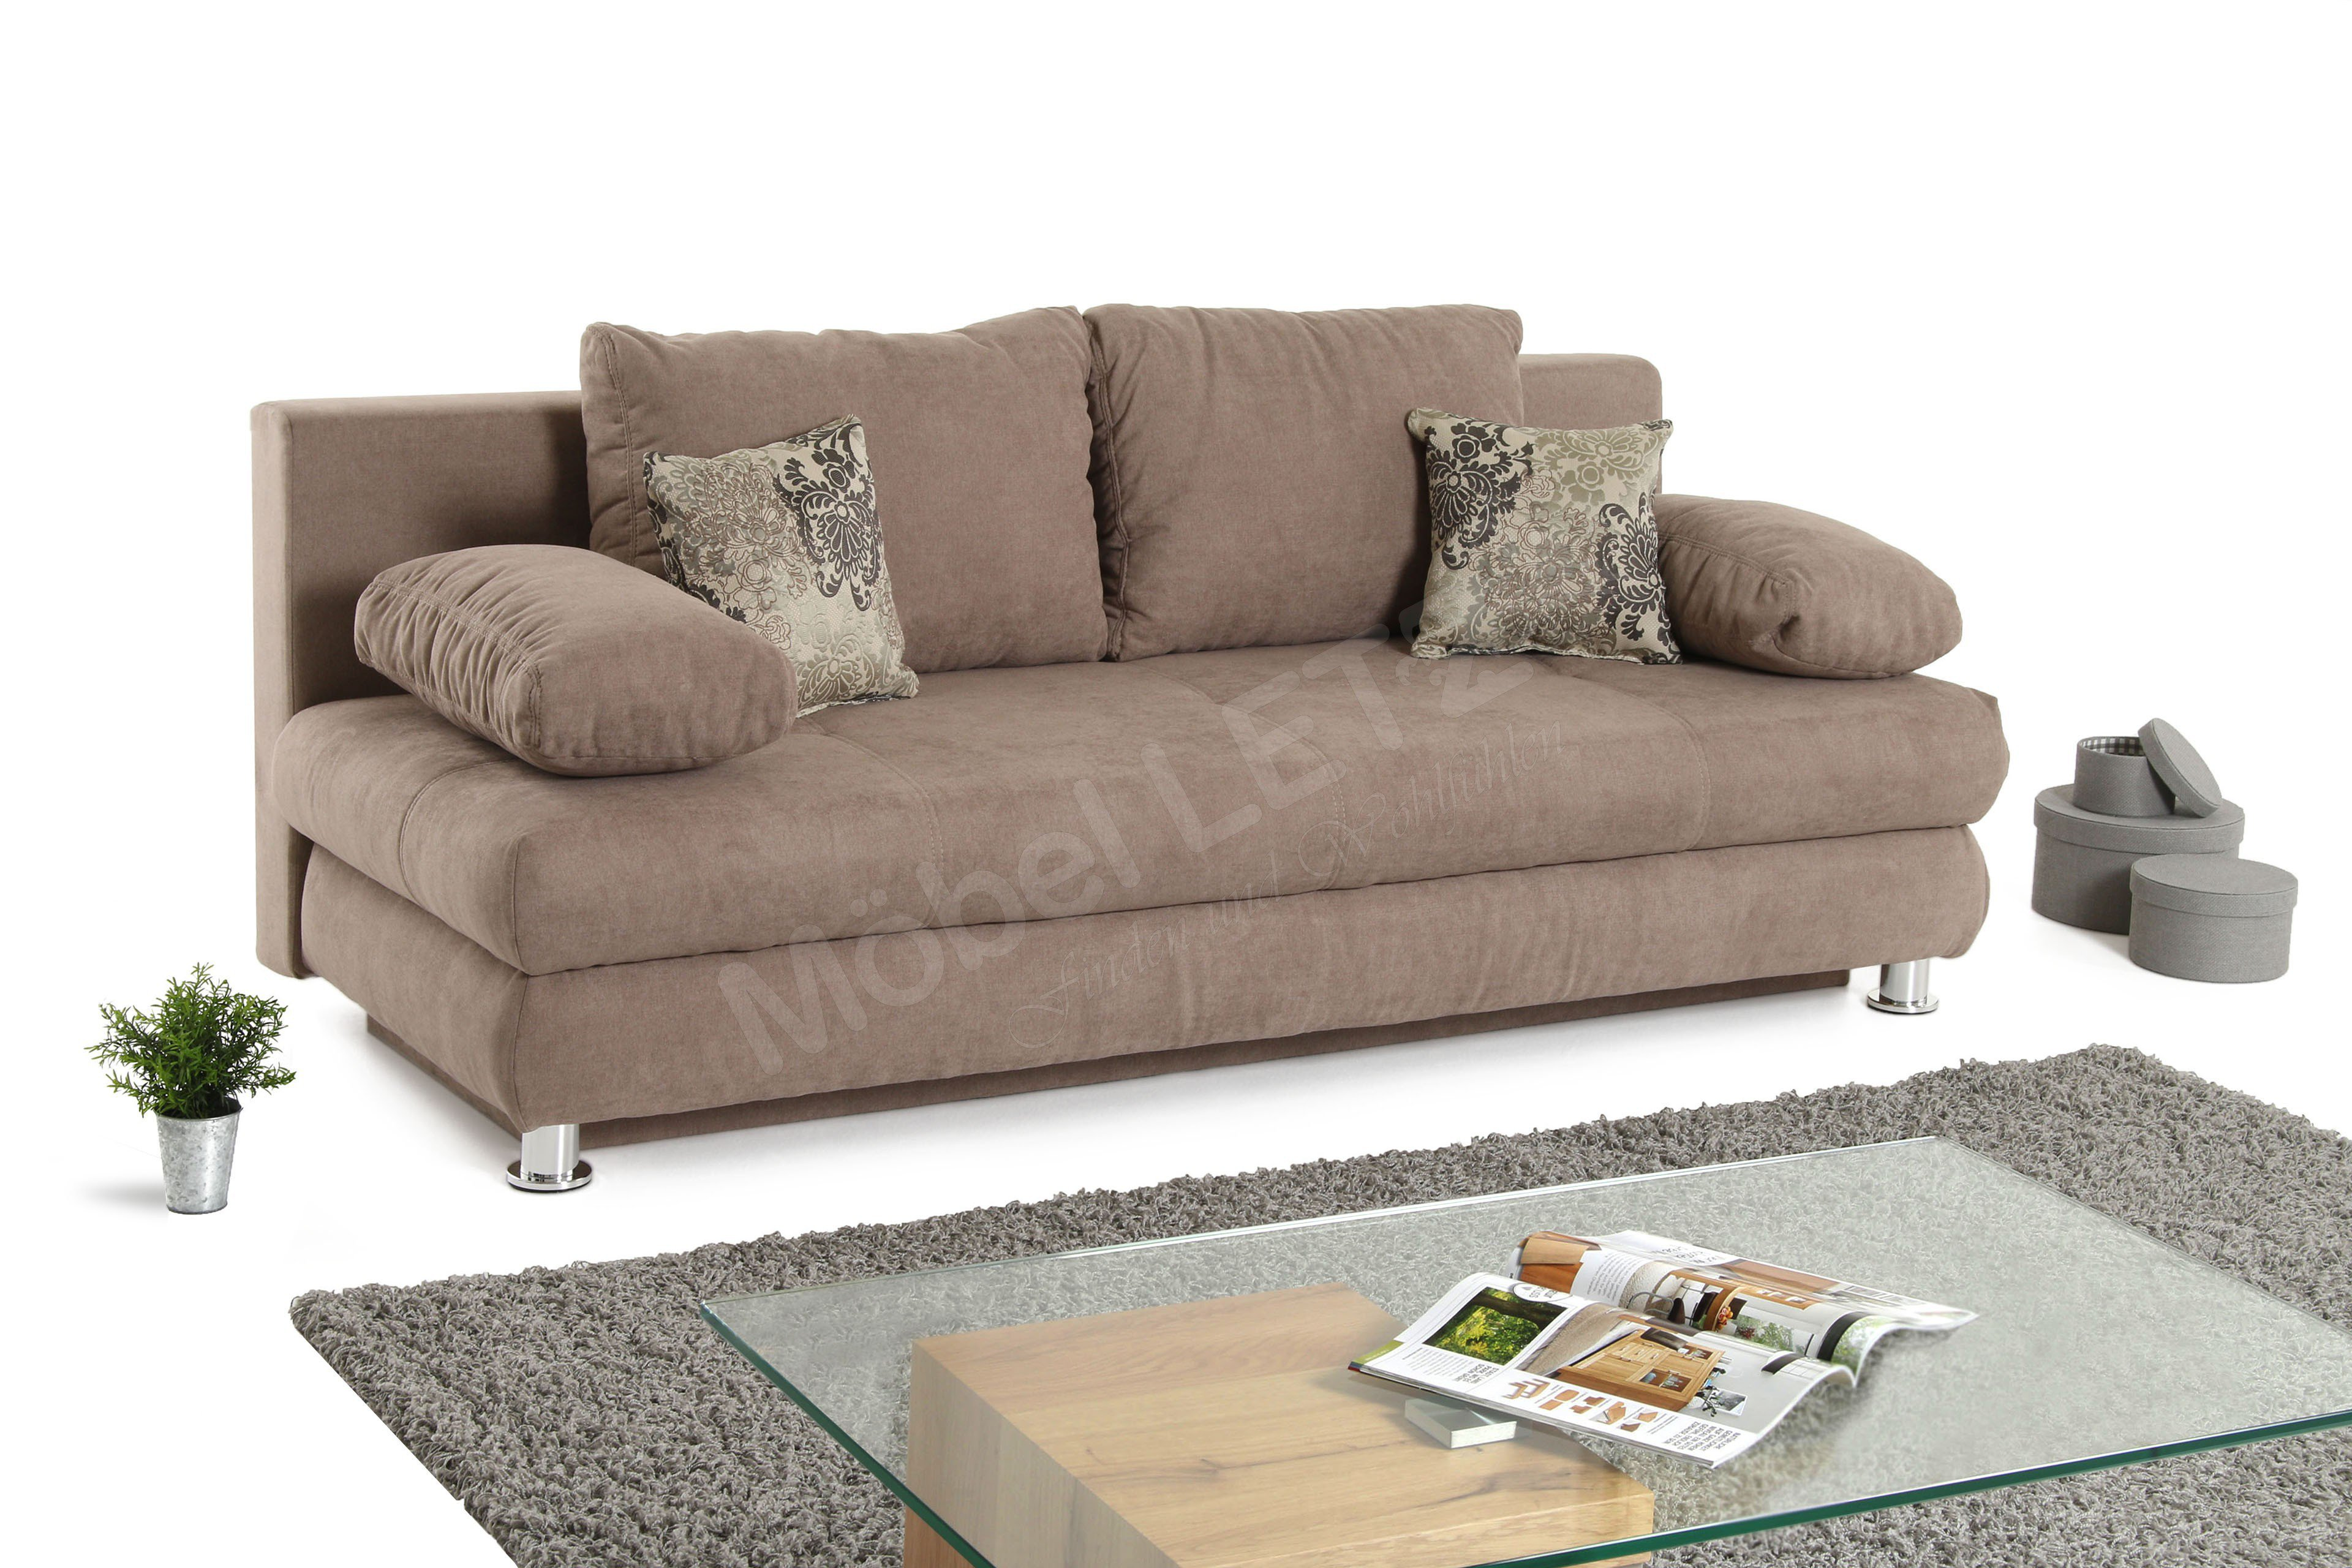 jockenh fer schlafsofa gent in hellbraun m bel letz ihr online shop. Black Bedroom Furniture Sets. Home Design Ideas